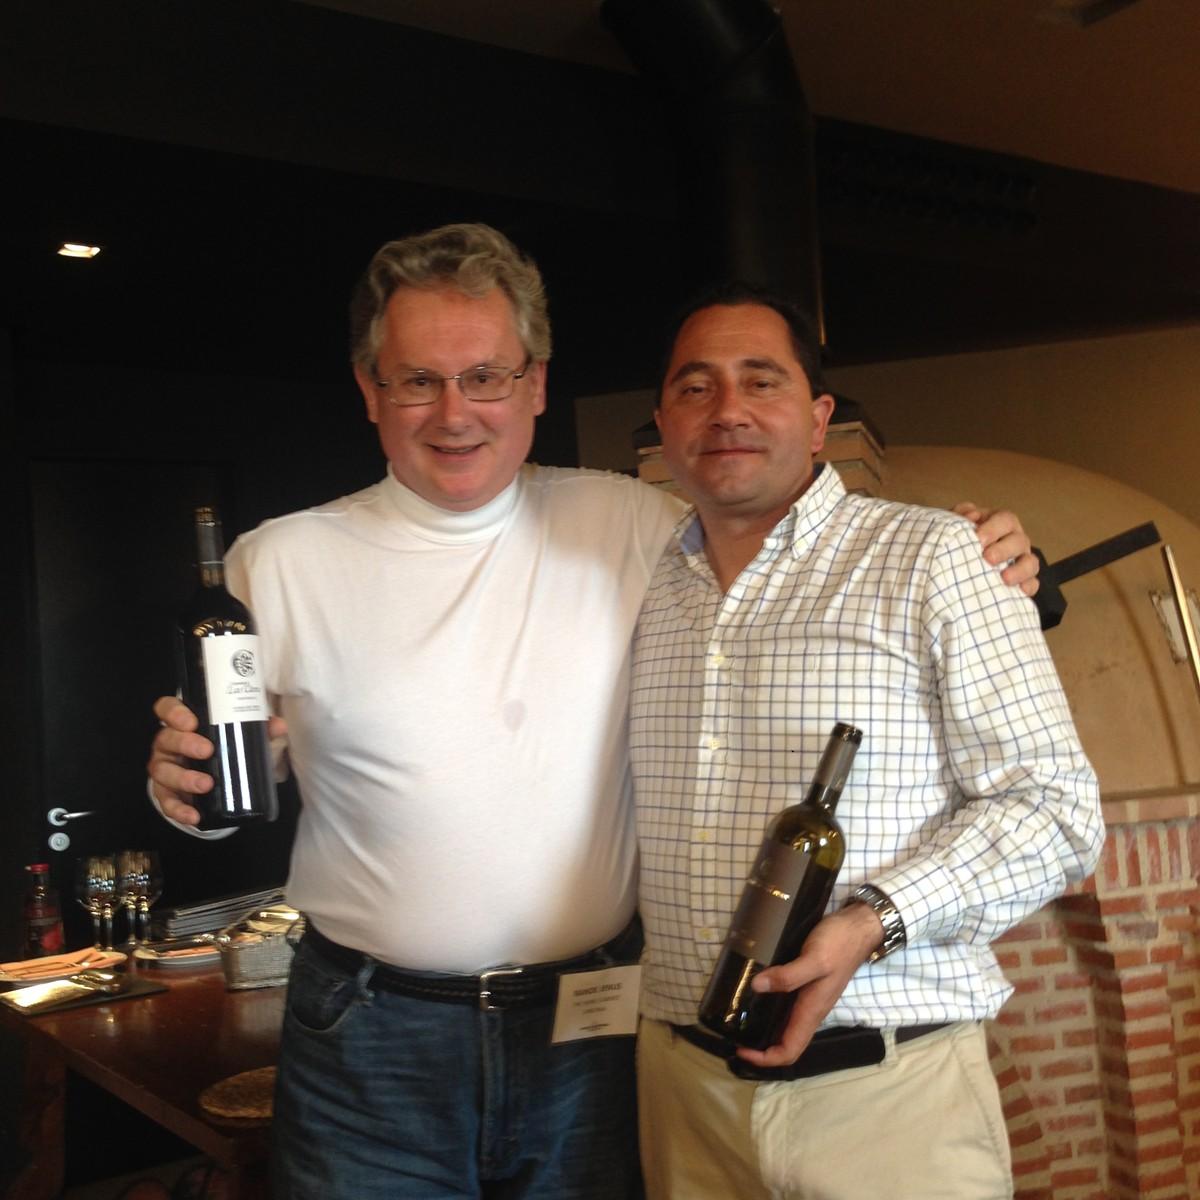 jorge ordoñez wine importer